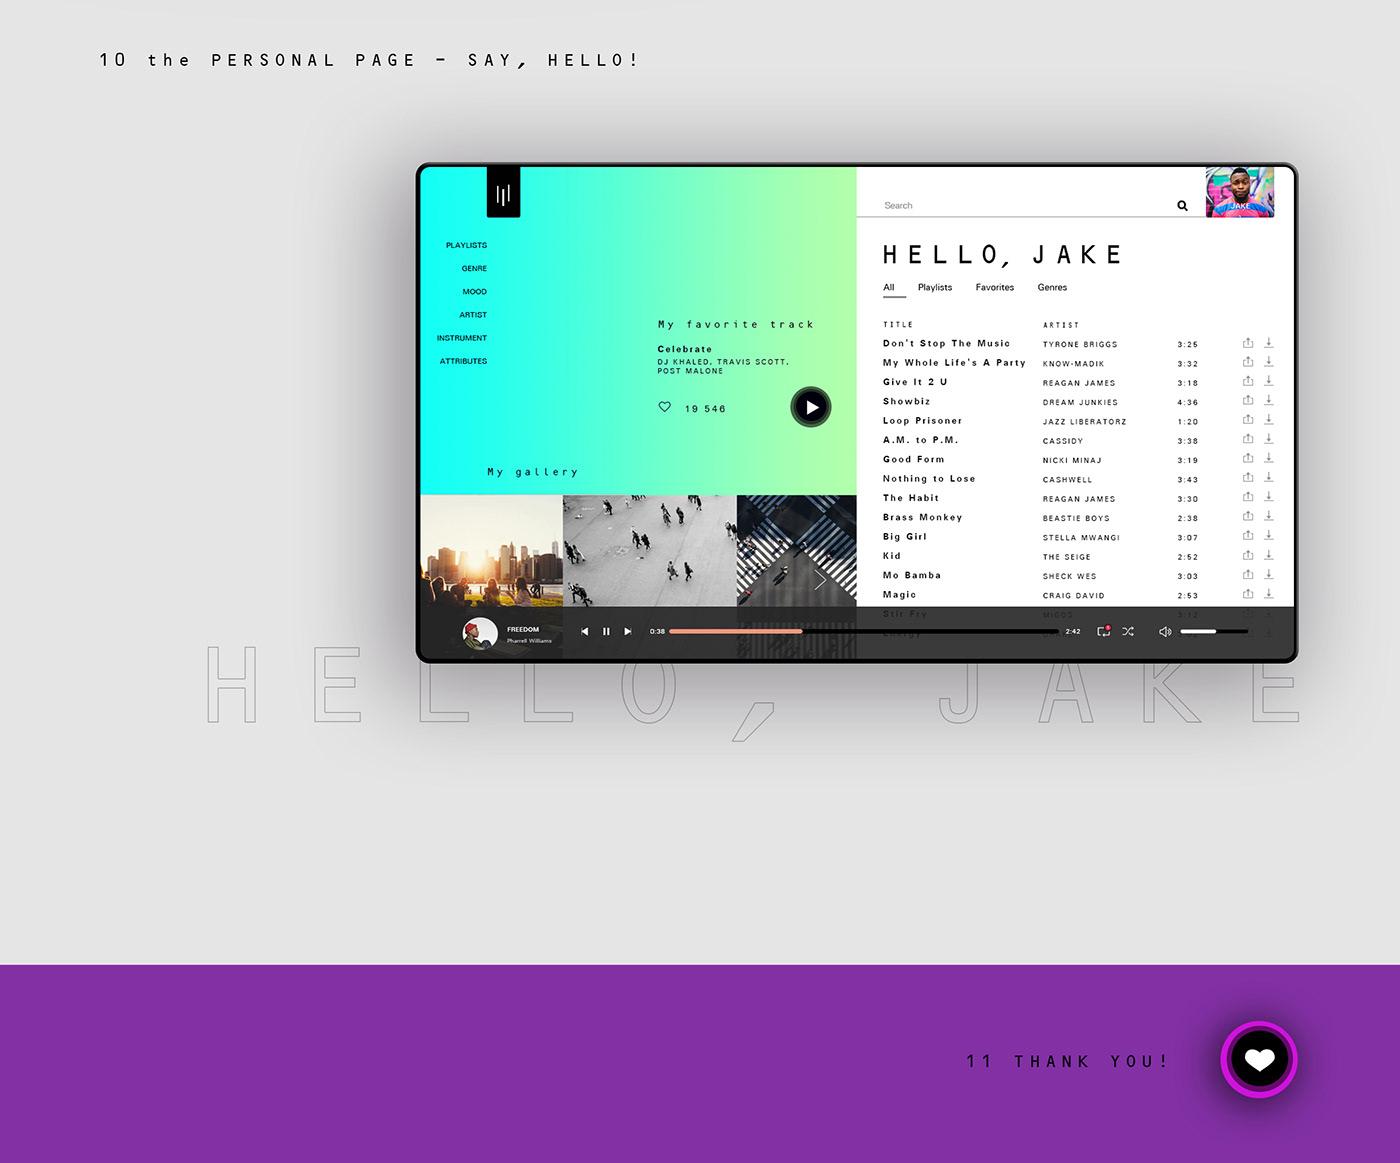 Web Interface interface design UI/UX Design UI Website Design Website ux brand graphic design